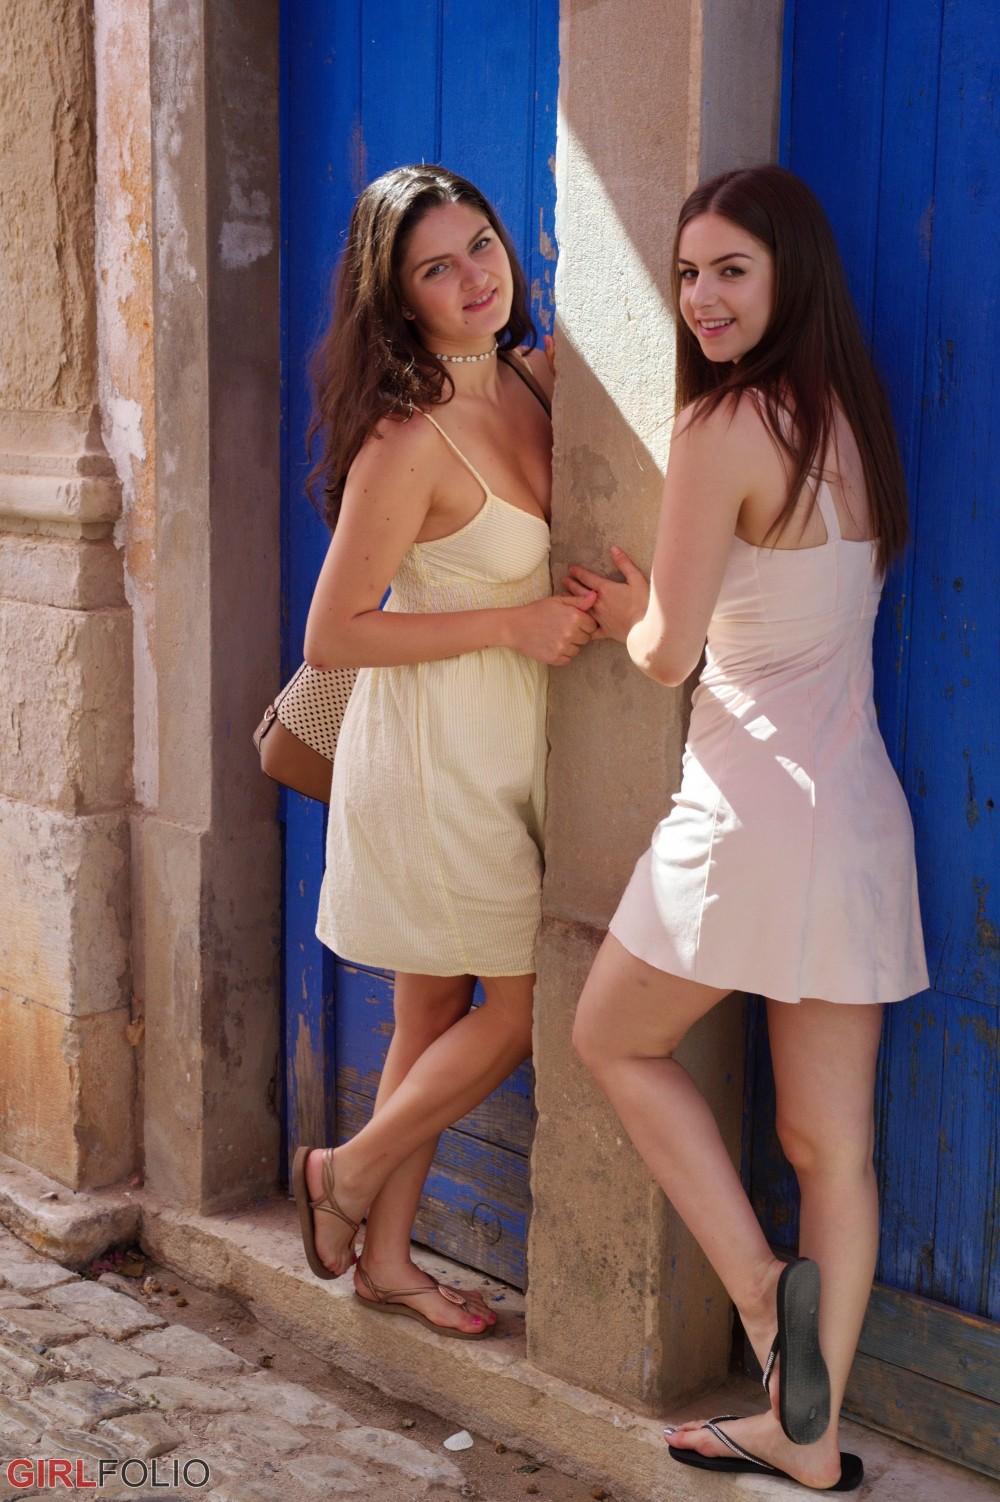 galleries girlfolio assets affiliates gallery stella cox and francesca bts medium stella cox and francesca bts 0007